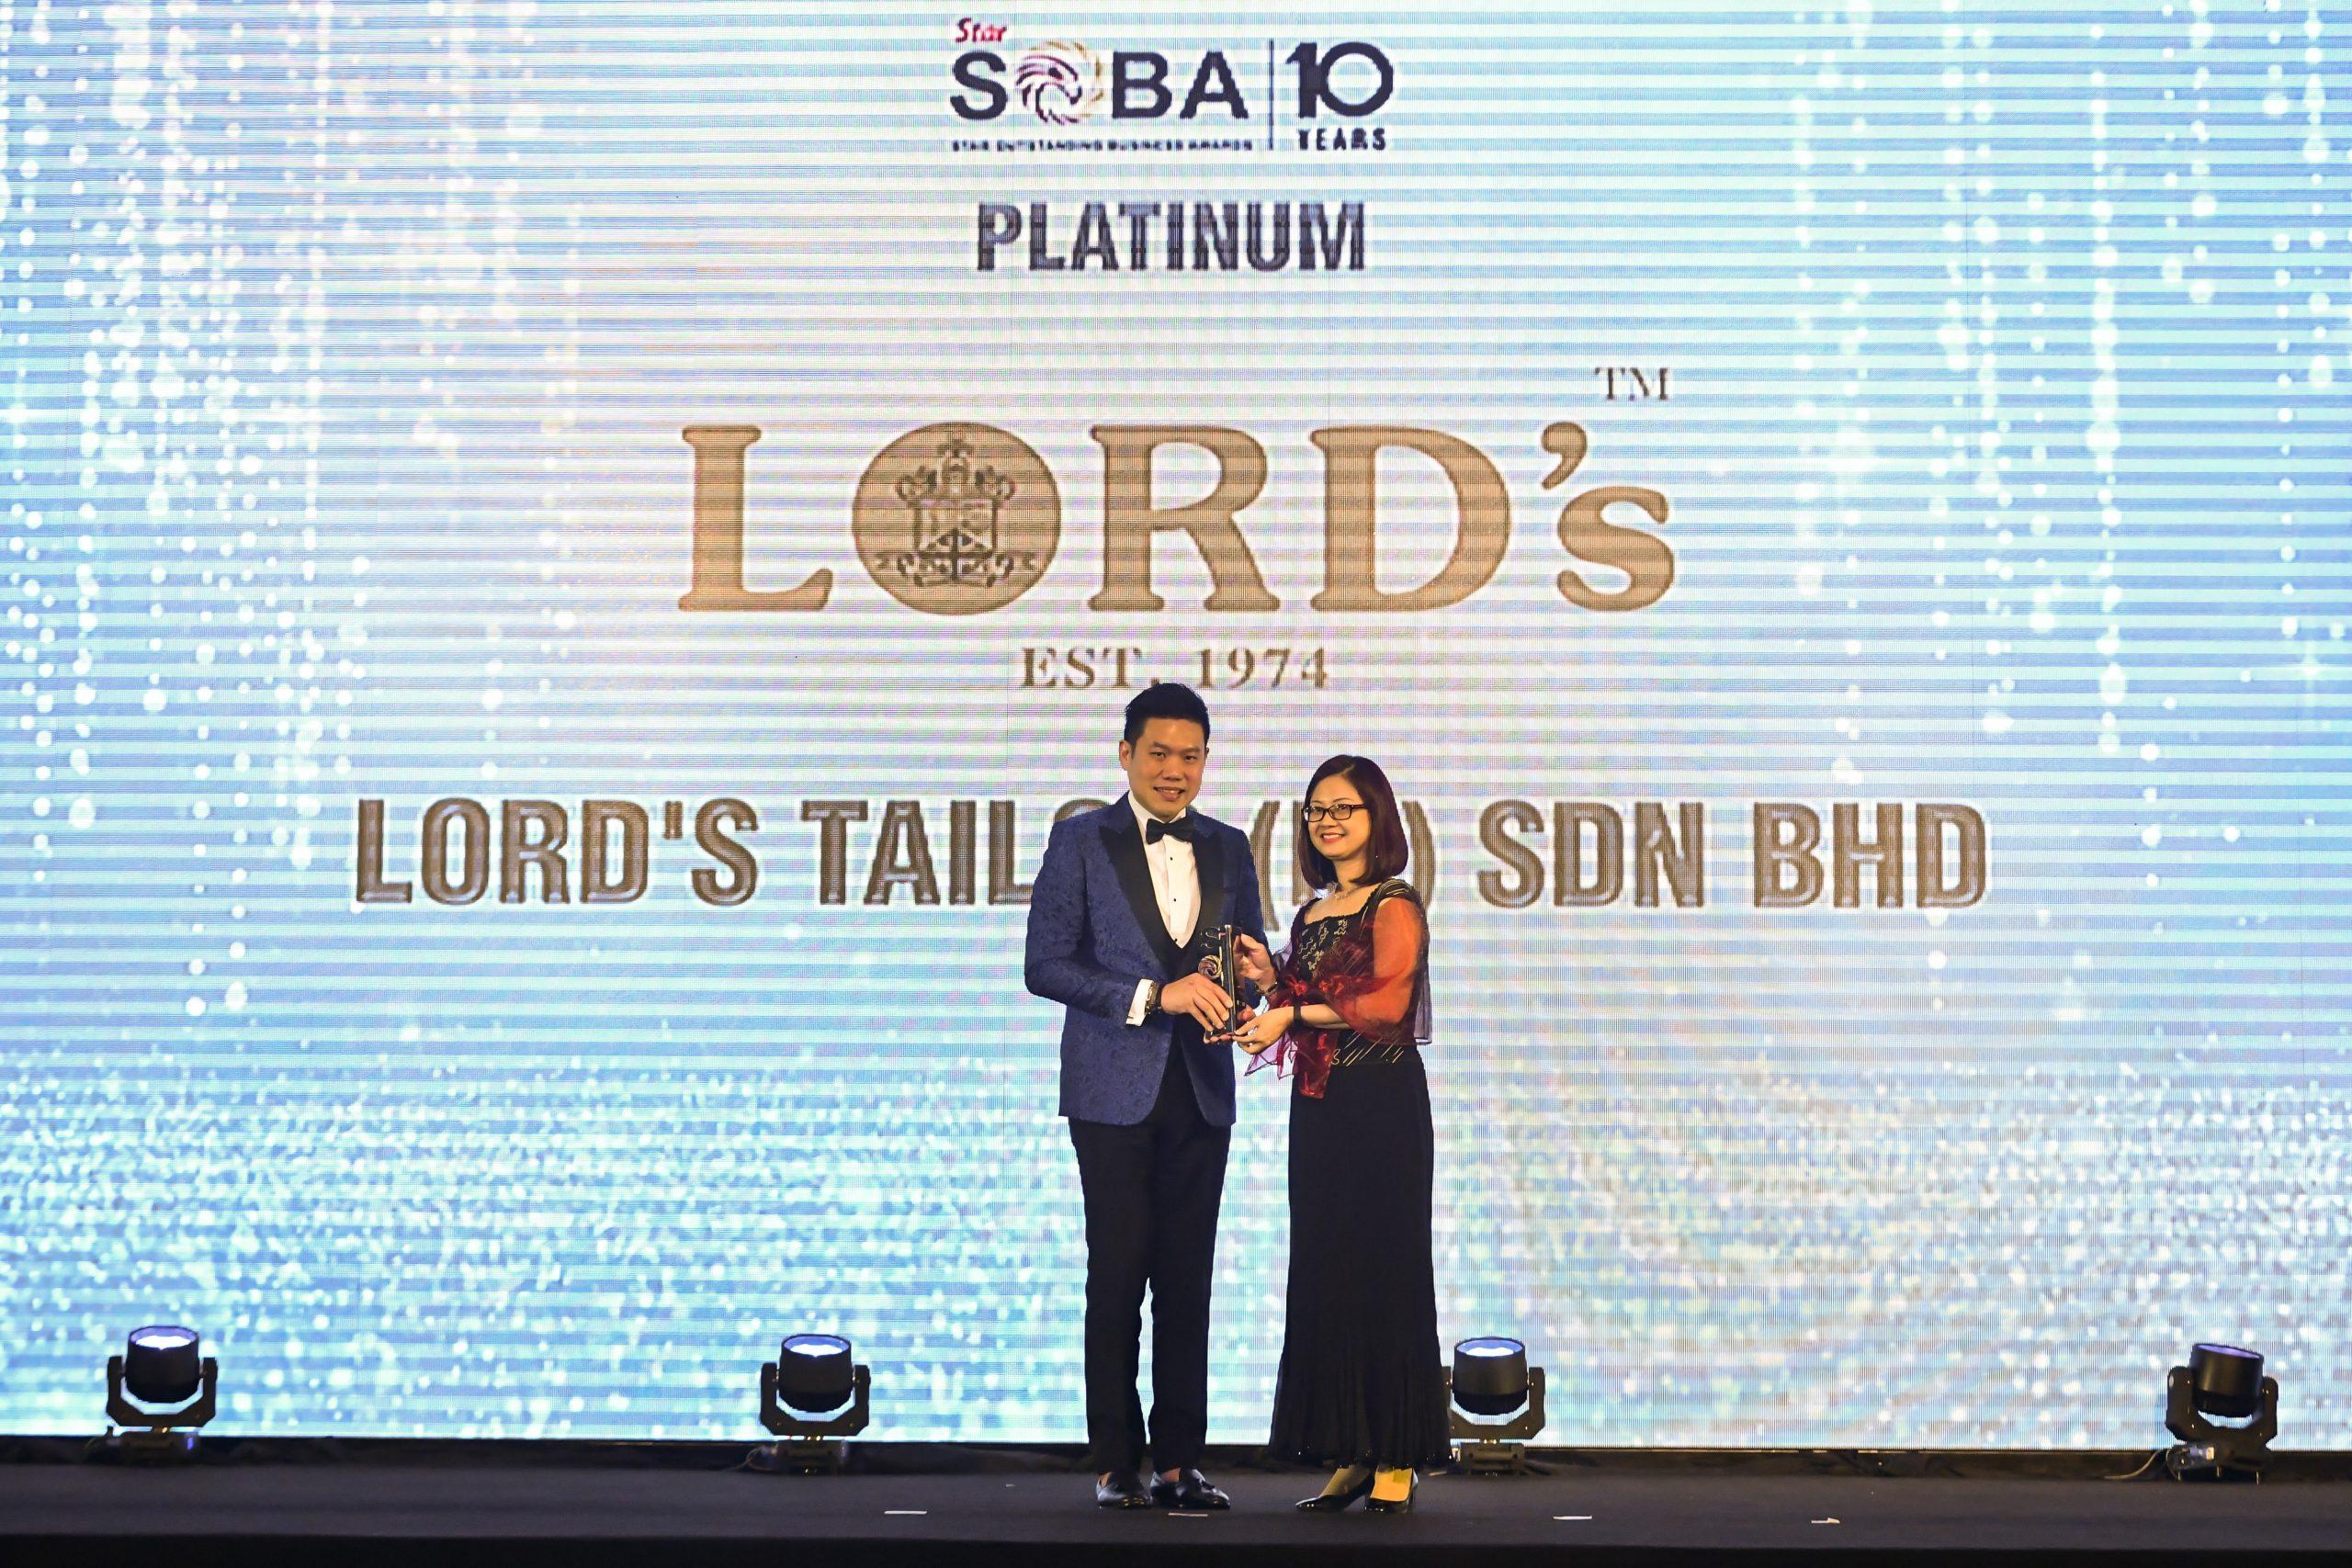 SOBA 2019 – BEST BRAND (PLATINUM) AWARD